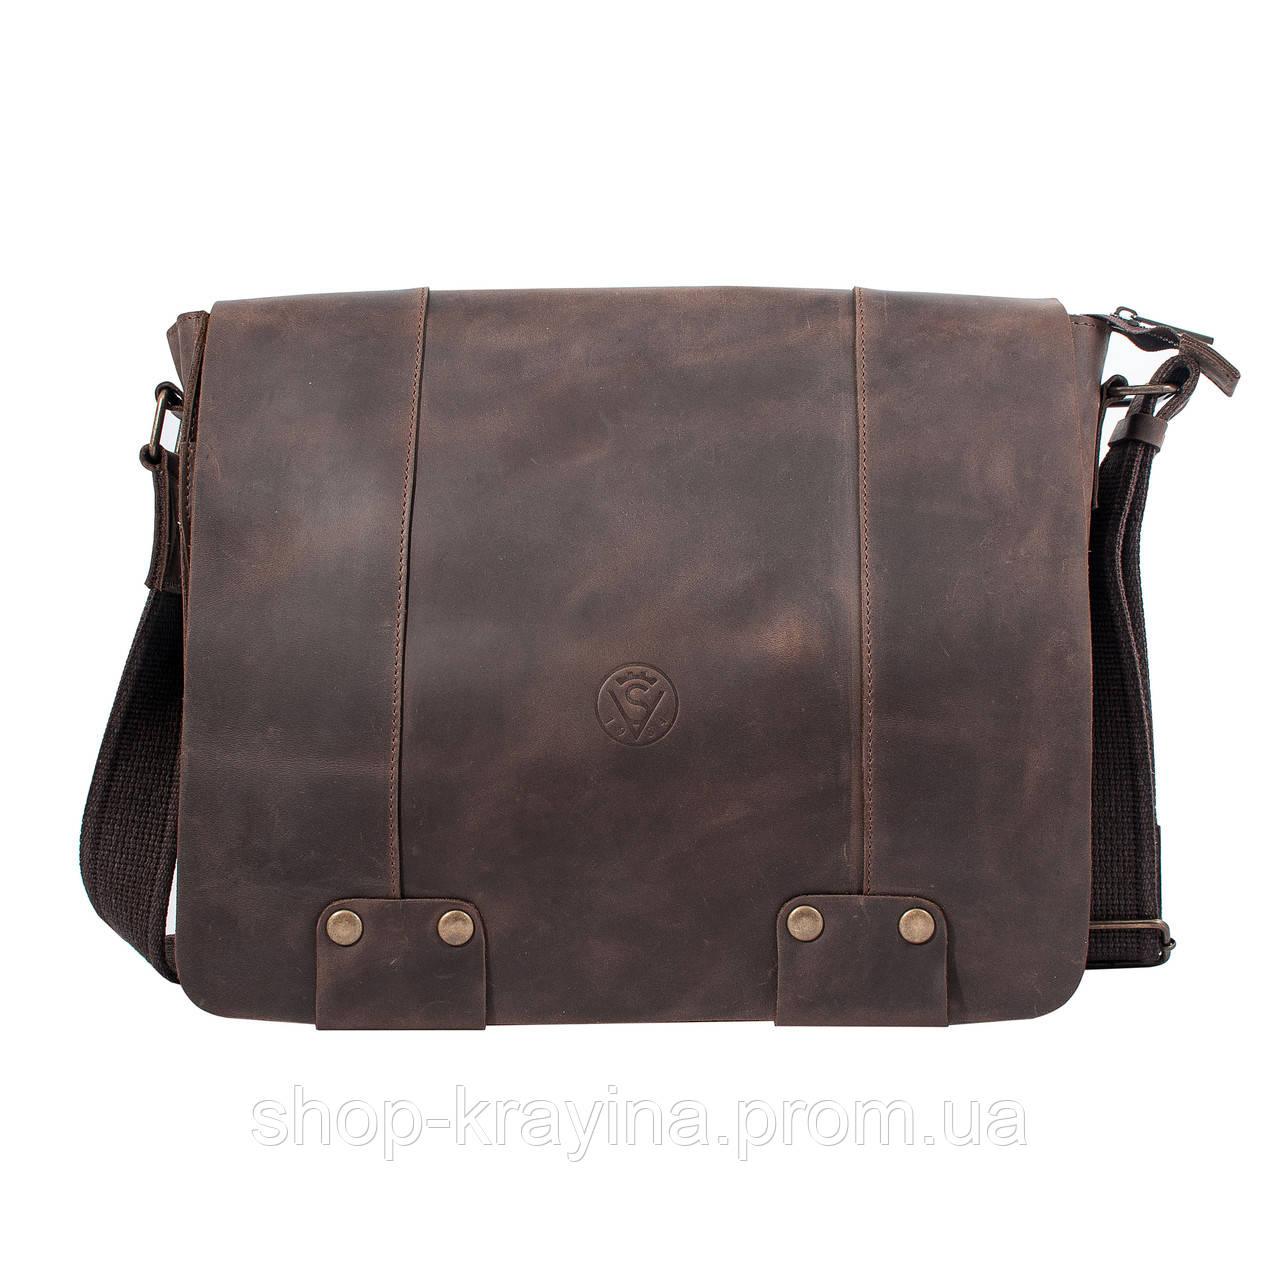 Кожаная сумка VS78 crazy horse 33х28х9 см